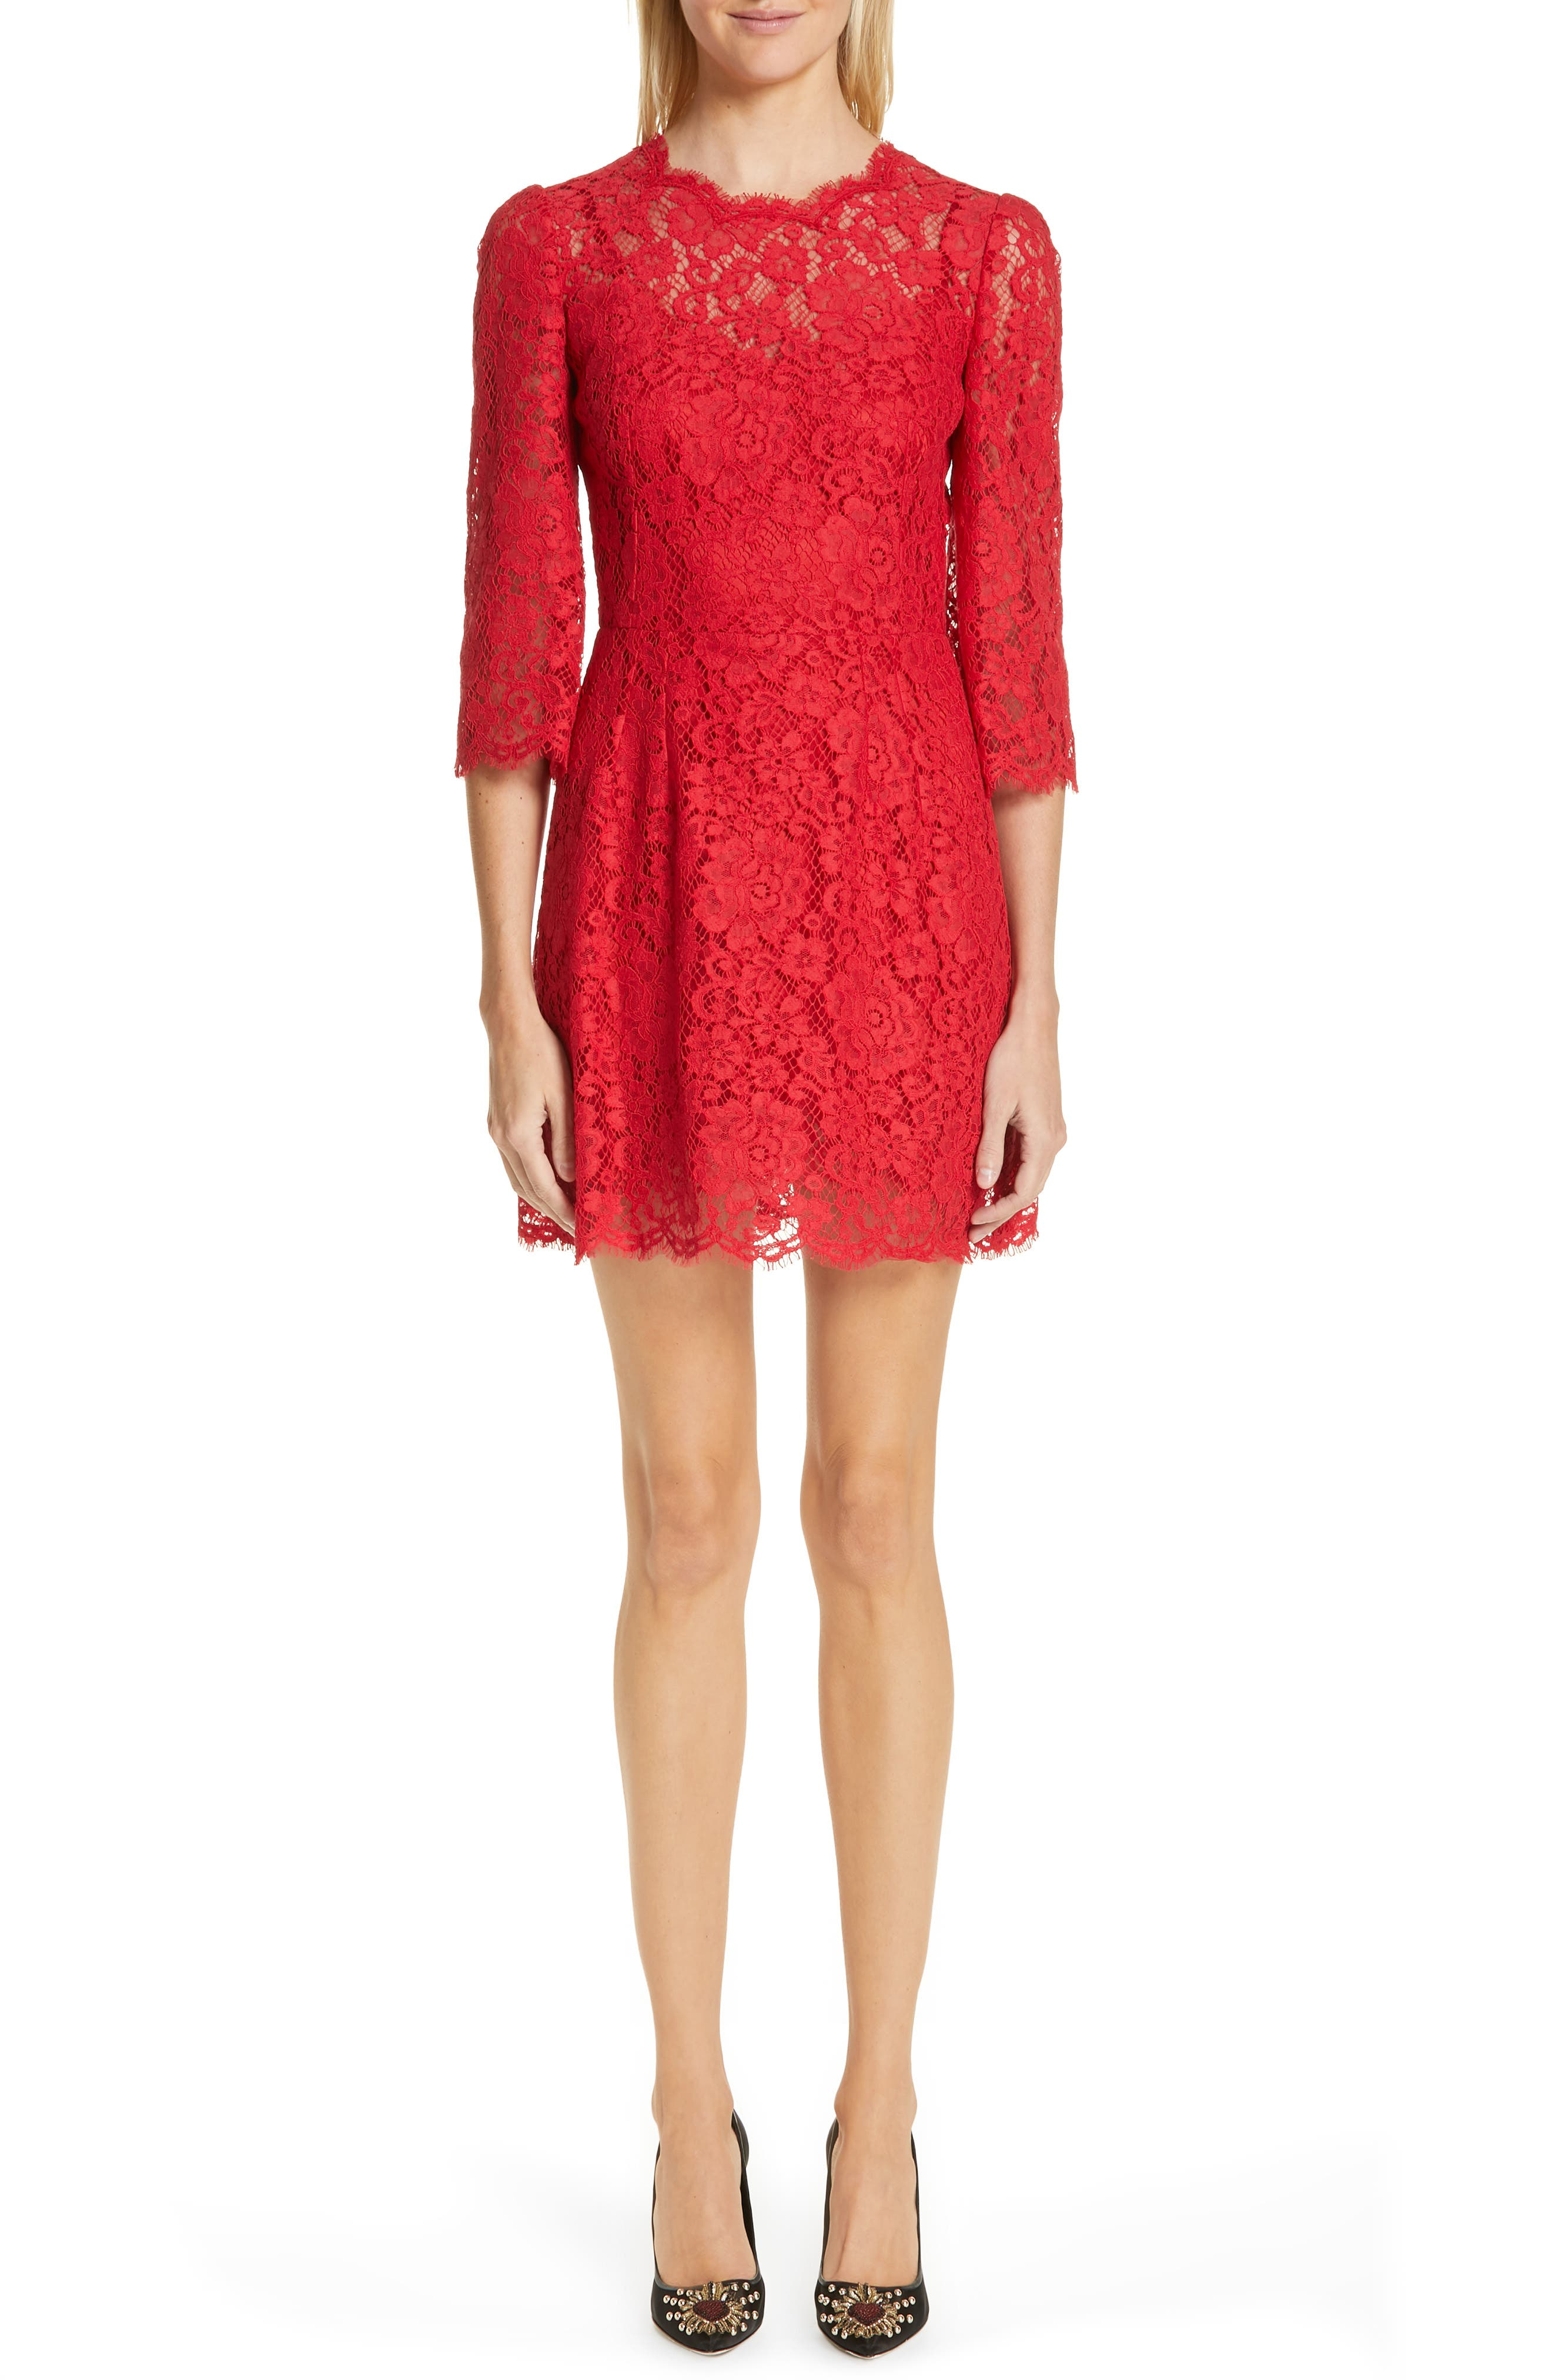 Dolce & gabbana Lace A-Line Dress, US / 42 IT - Red